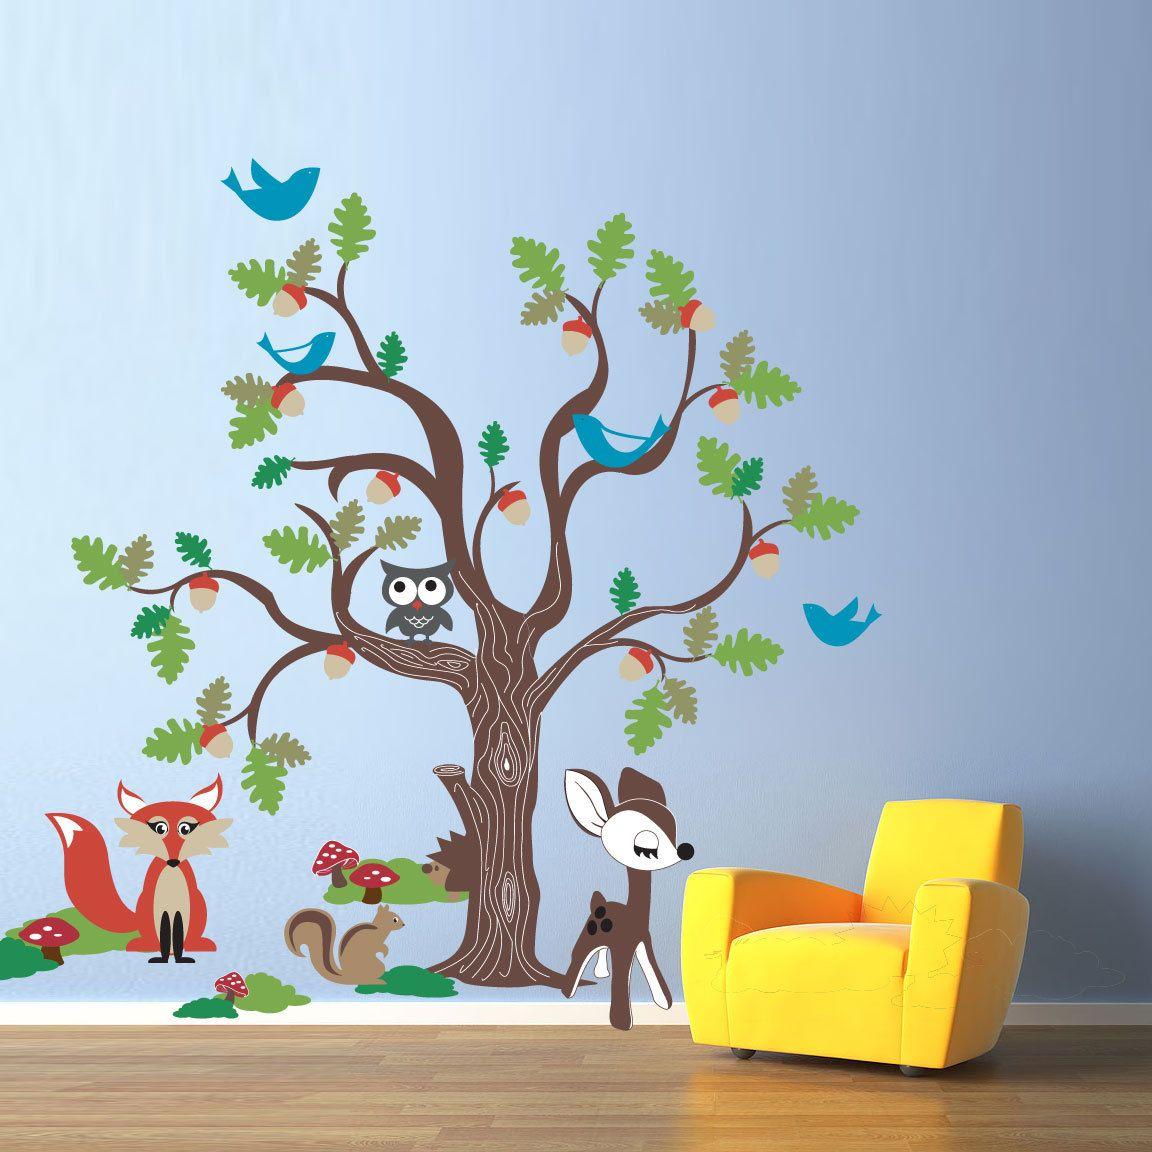 Vinyl wall decal sticker art oak tree and woodland animals extra